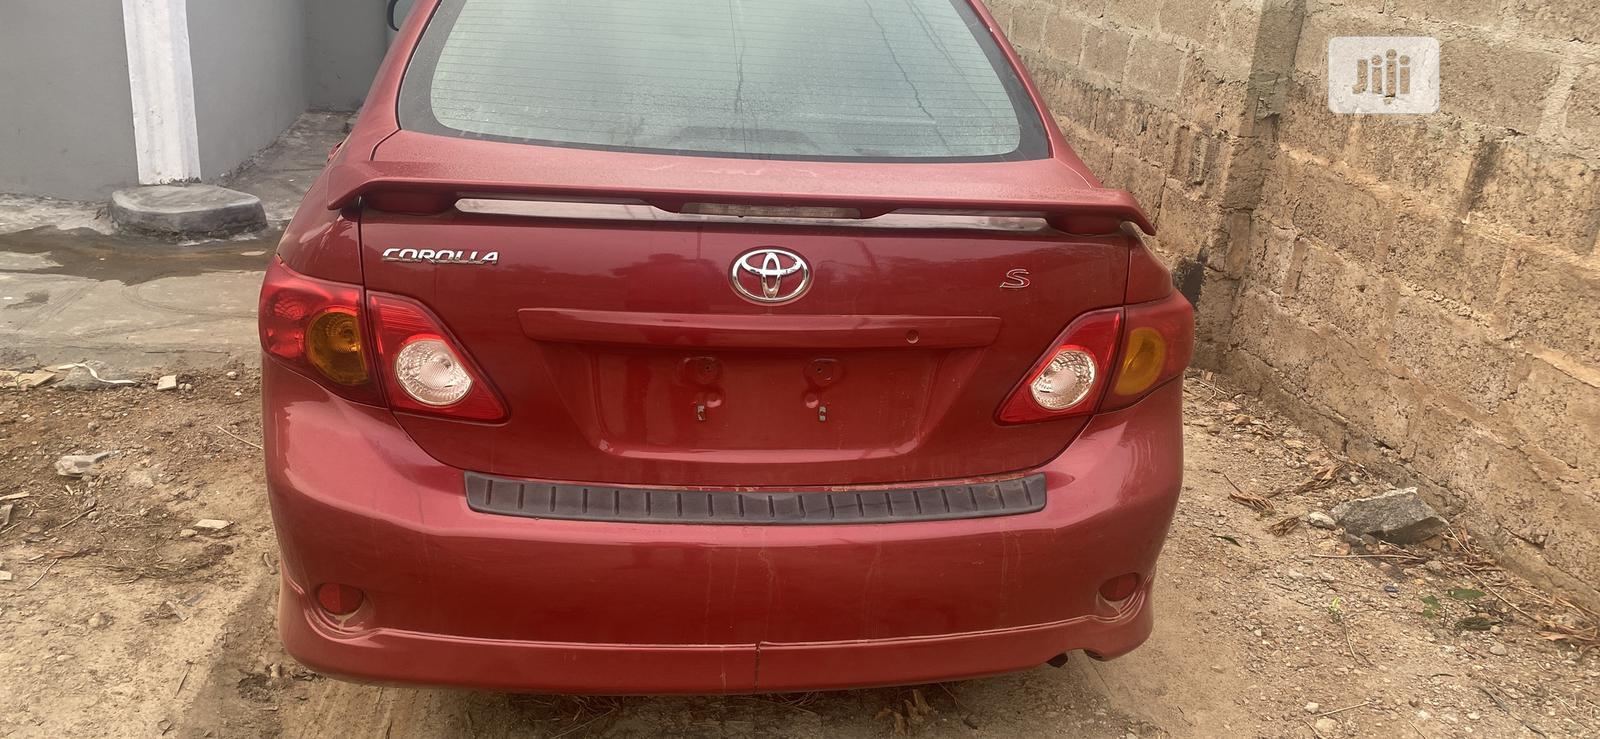 Toyota Corolla 2010 Red | Cars for sale in Ife, Osun State, Nigeria